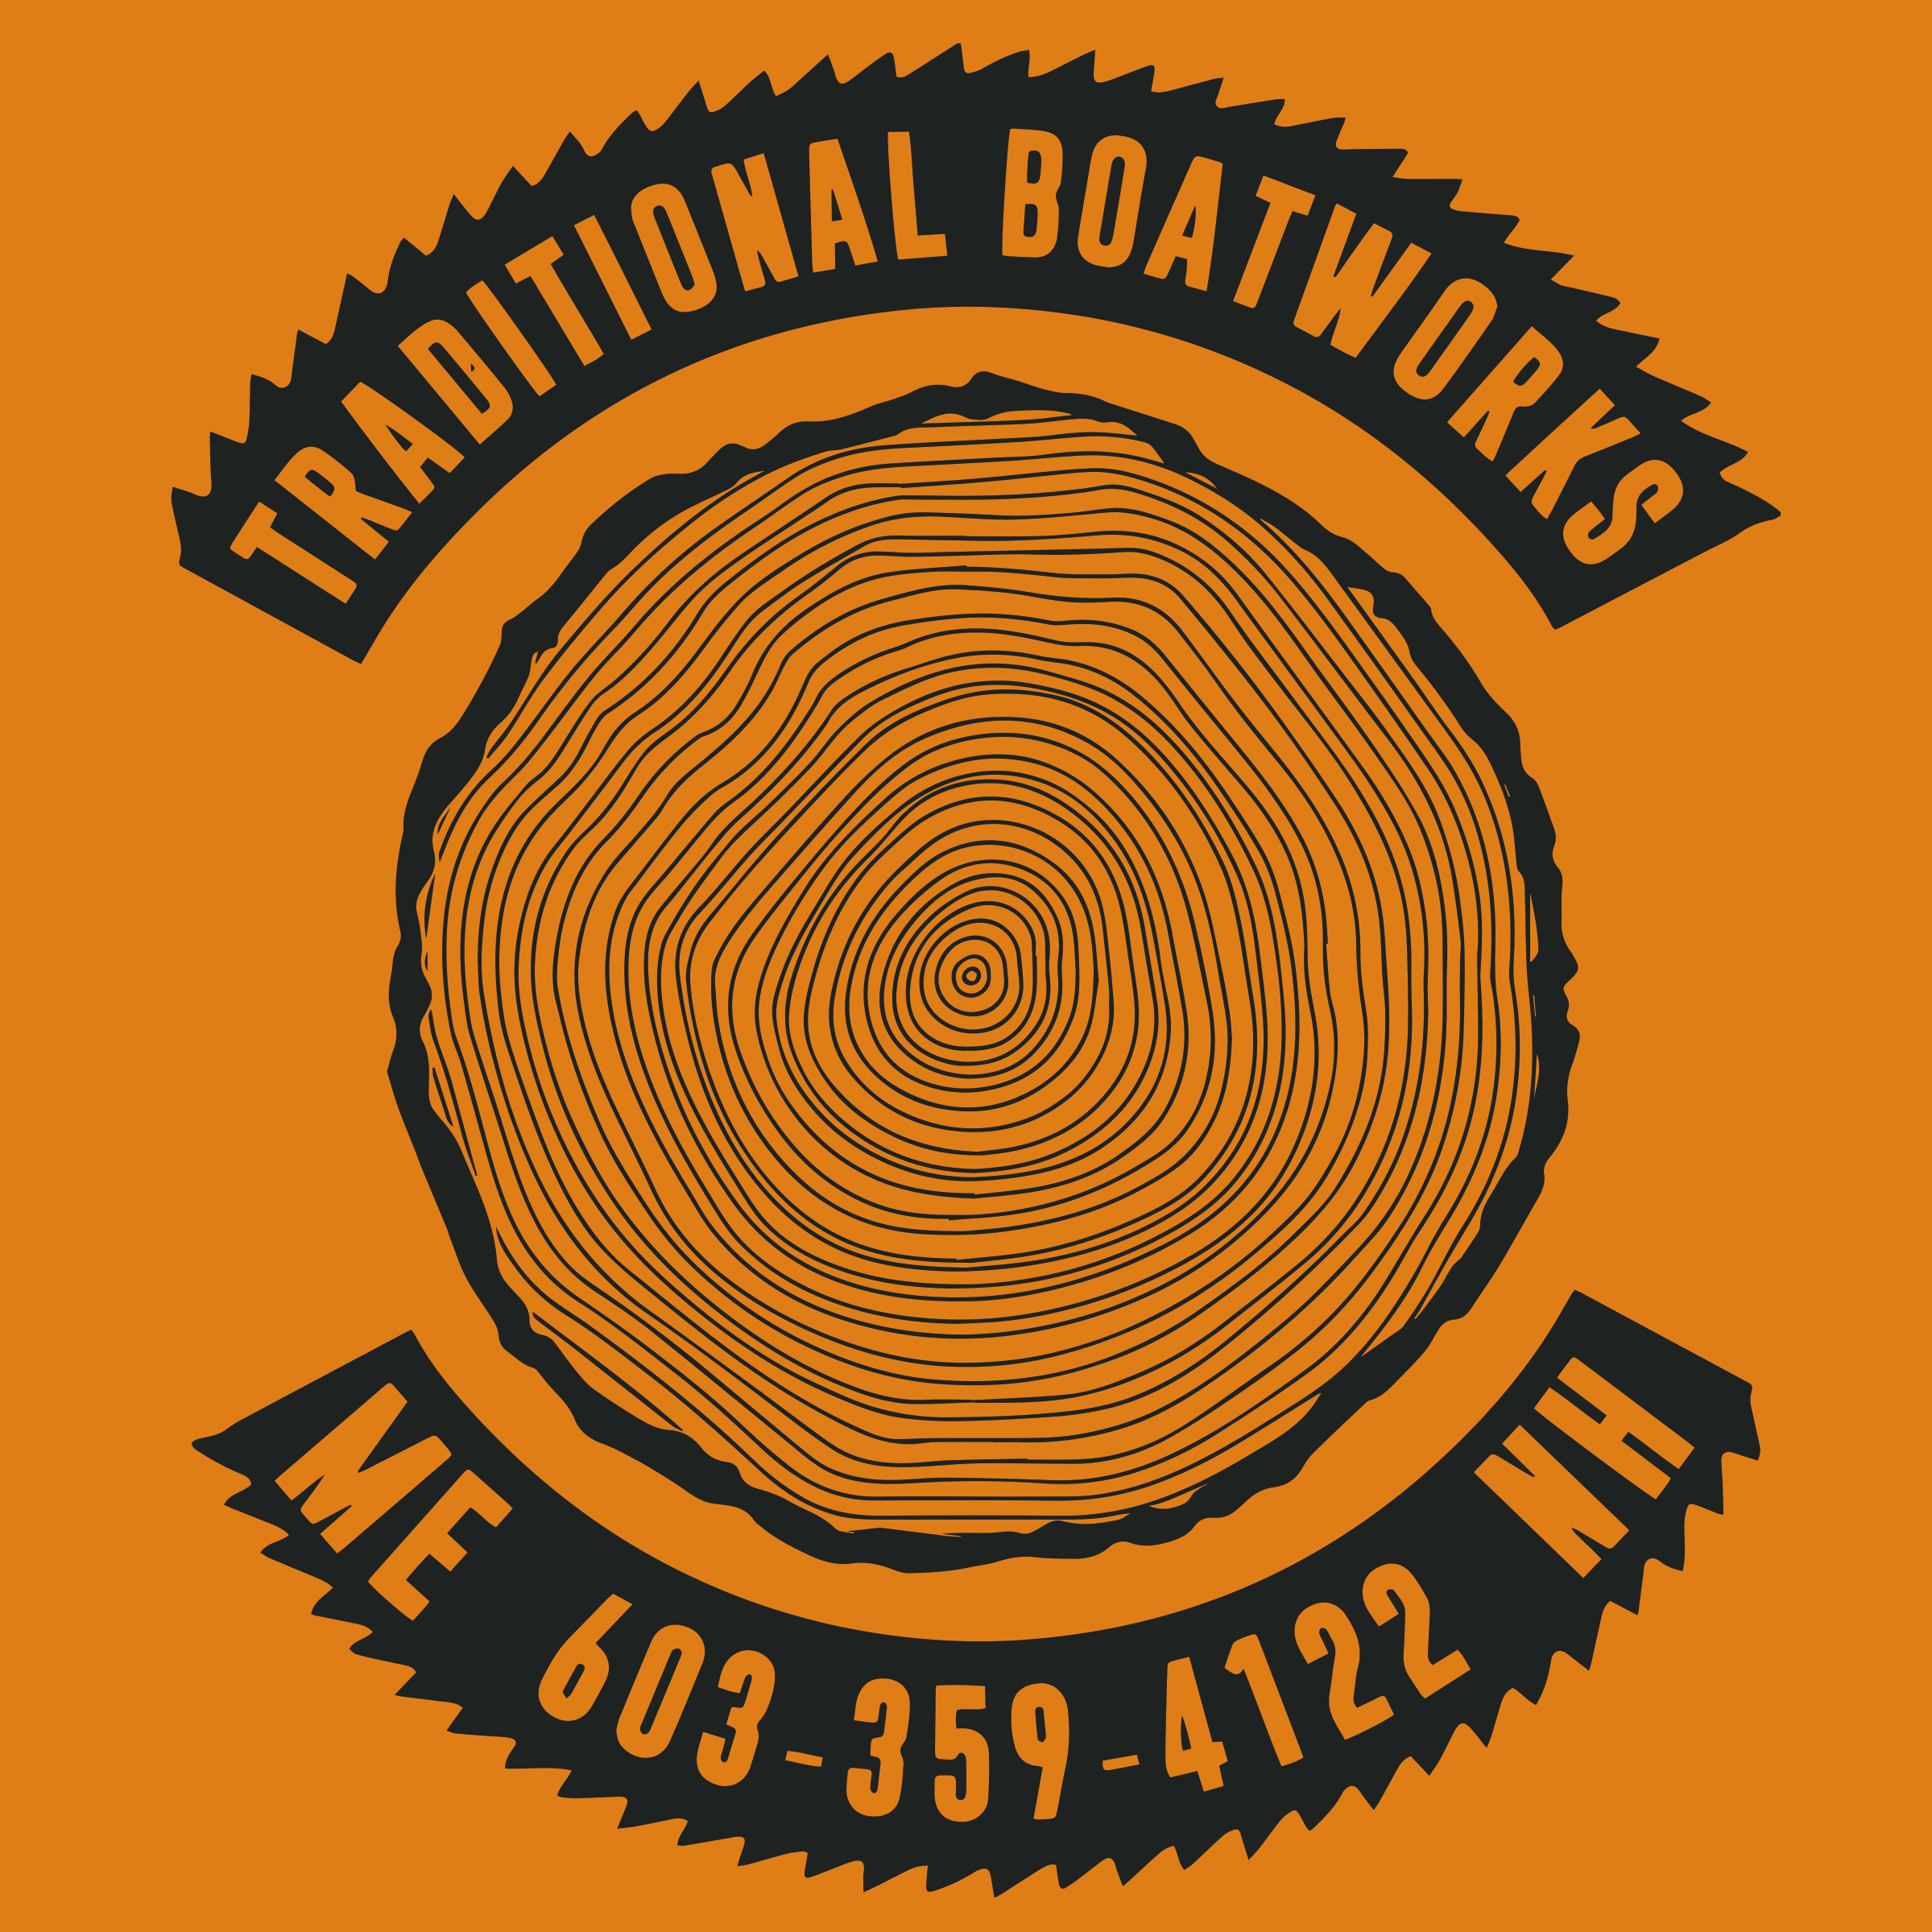 trad-boat-logo-2a.jpg